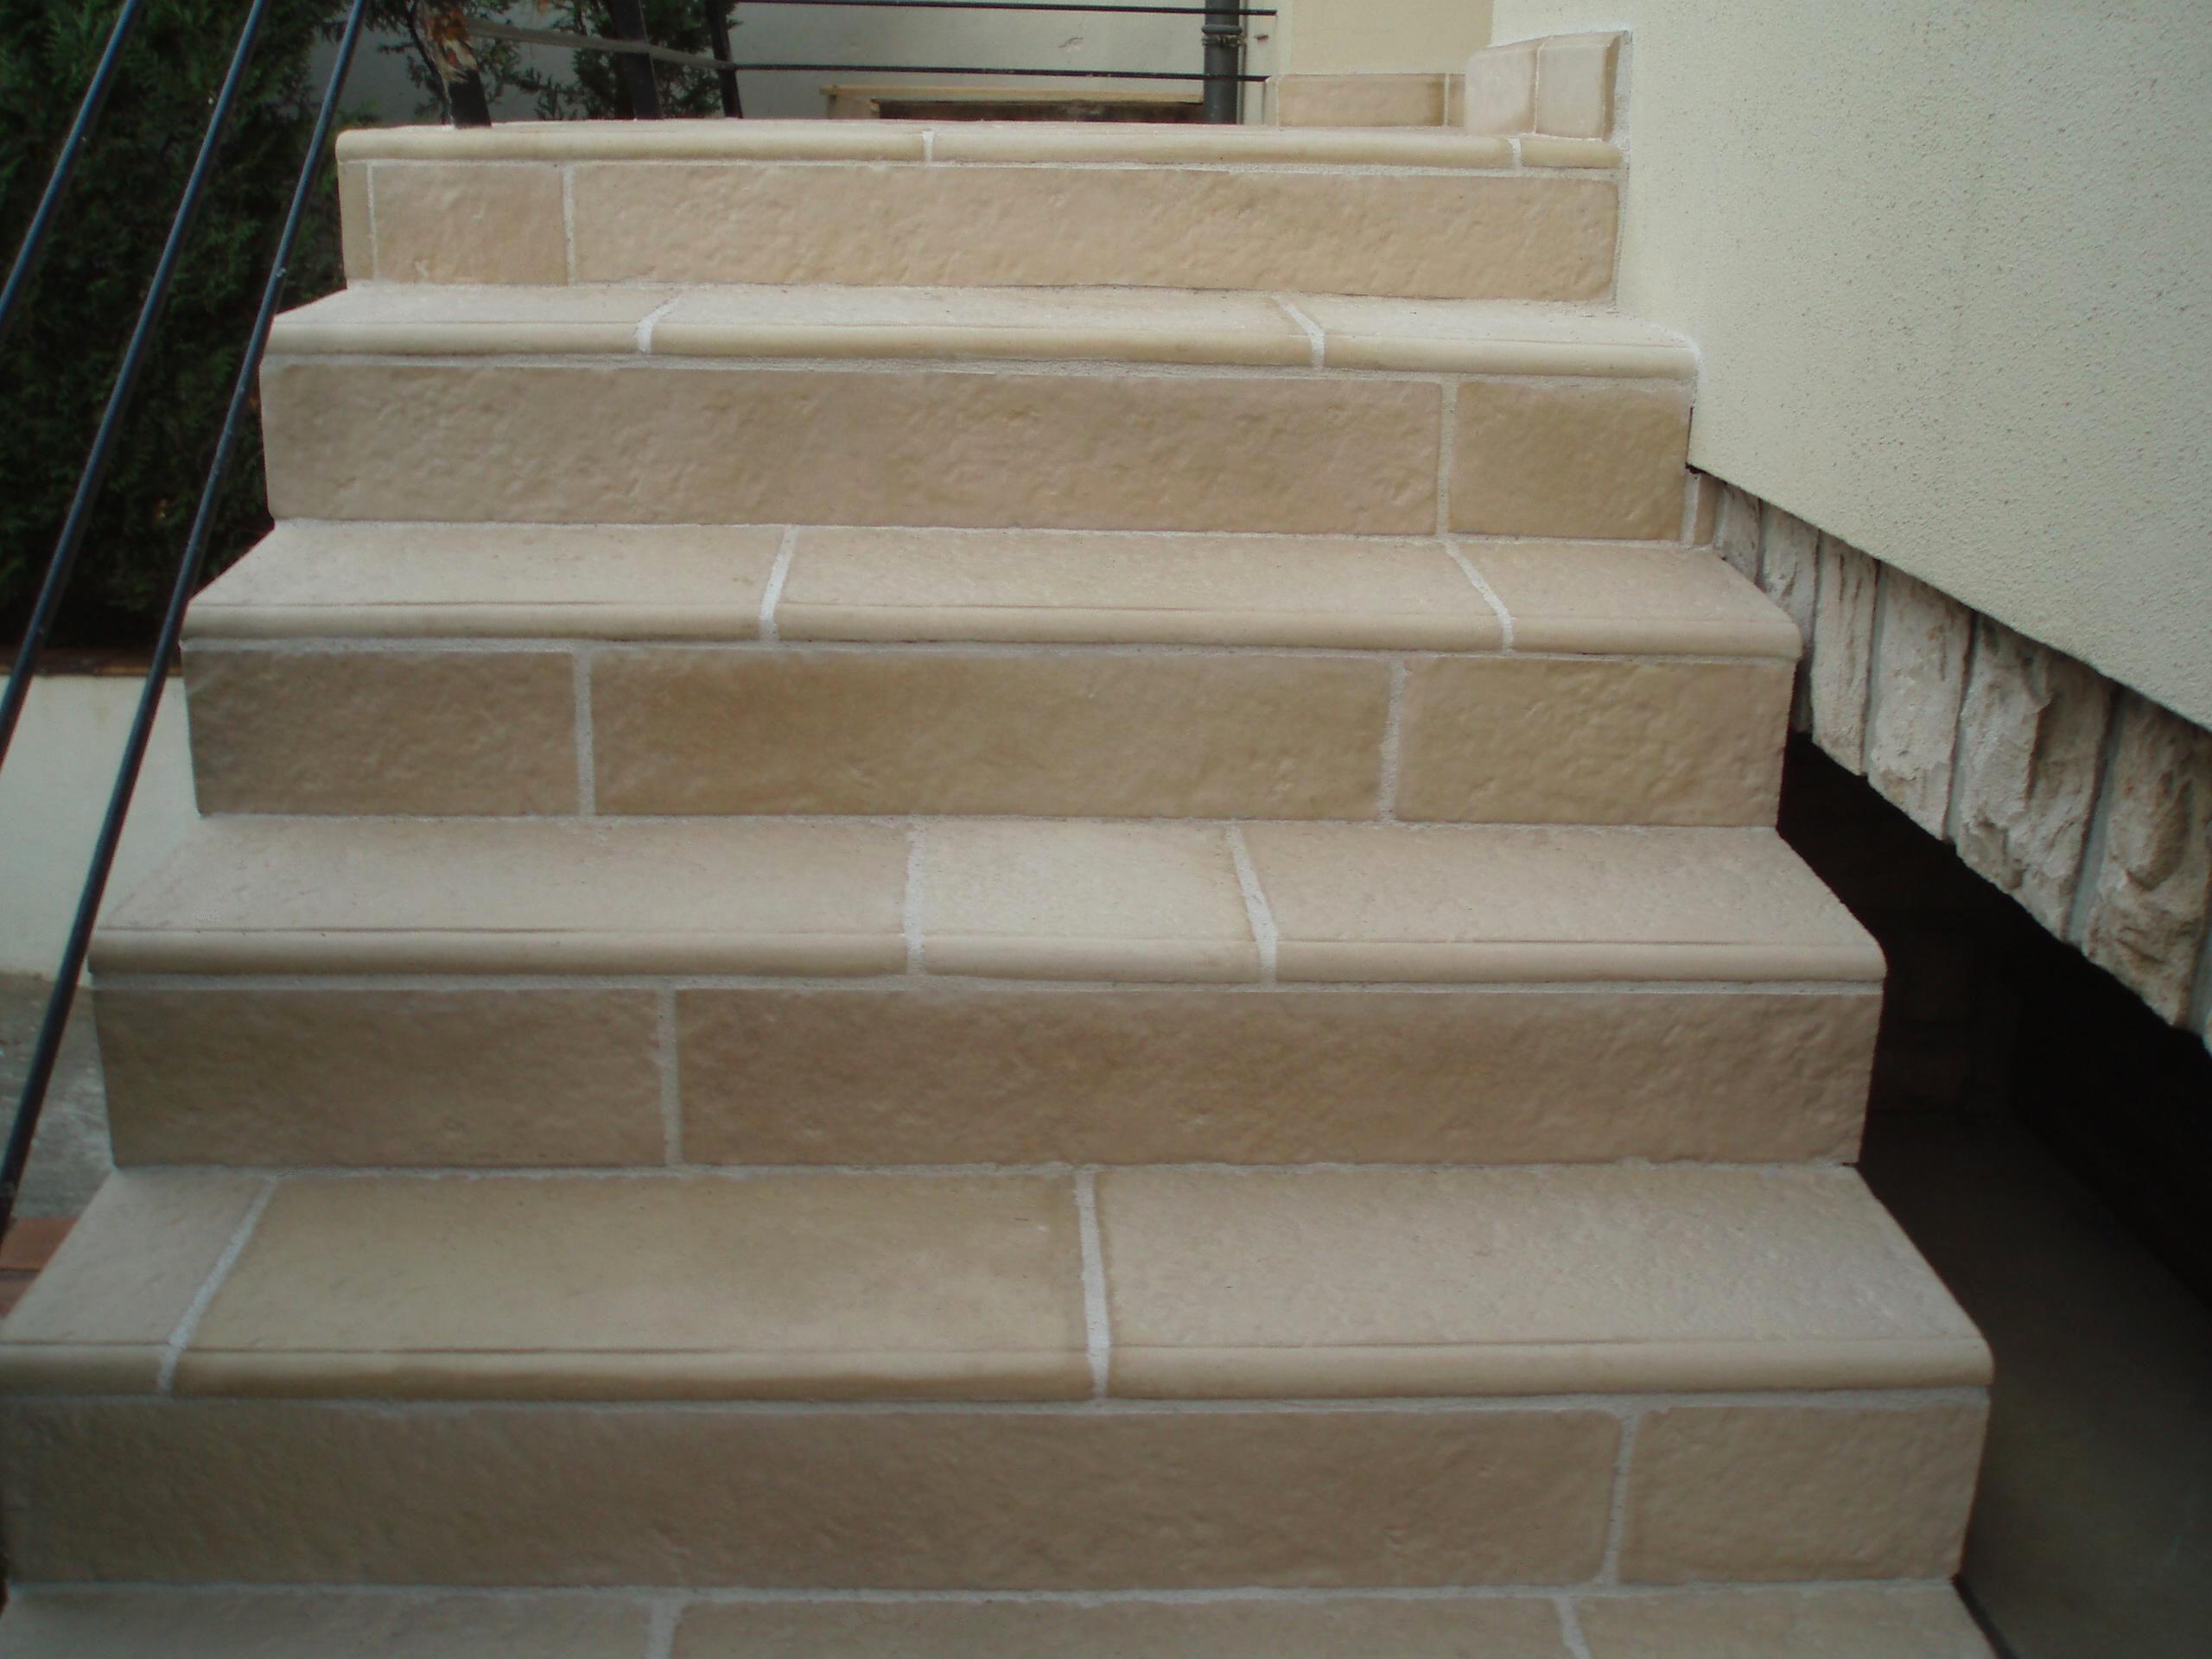 Habillage D Escalier En Pierre Reconstituee Pierre Concassee Et Moulee Escalier En Pierre Habillage Escalier Beton Pierre Reconstituee